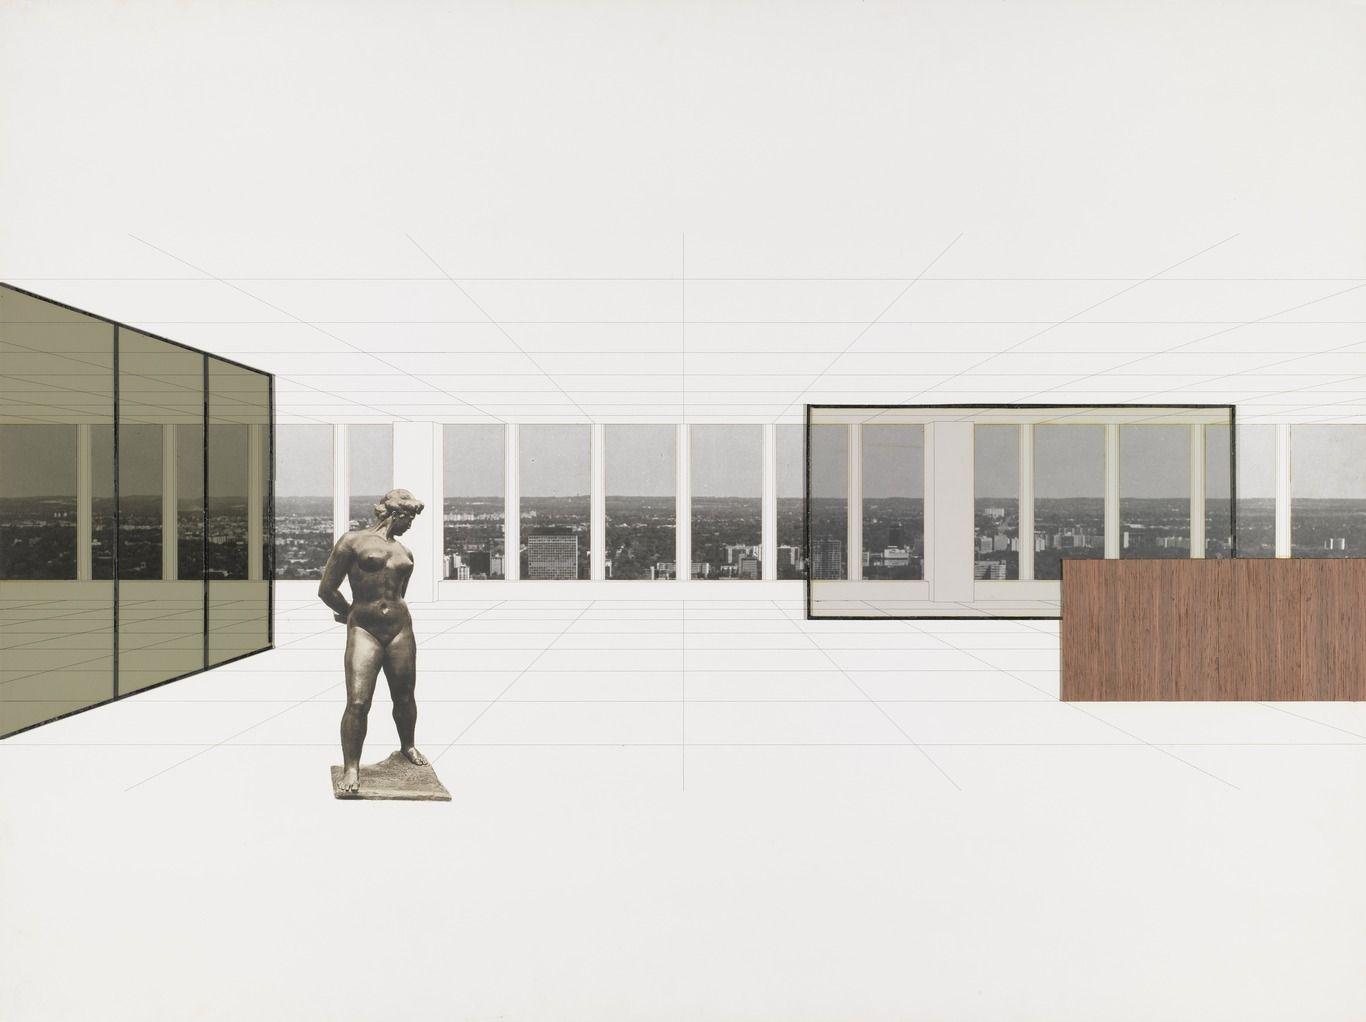 ludwig mies van der rohe 1886 1969 georg schaefer museum project schweinfurt germany. Black Bedroom Furniture Sets. Home Design Ideas